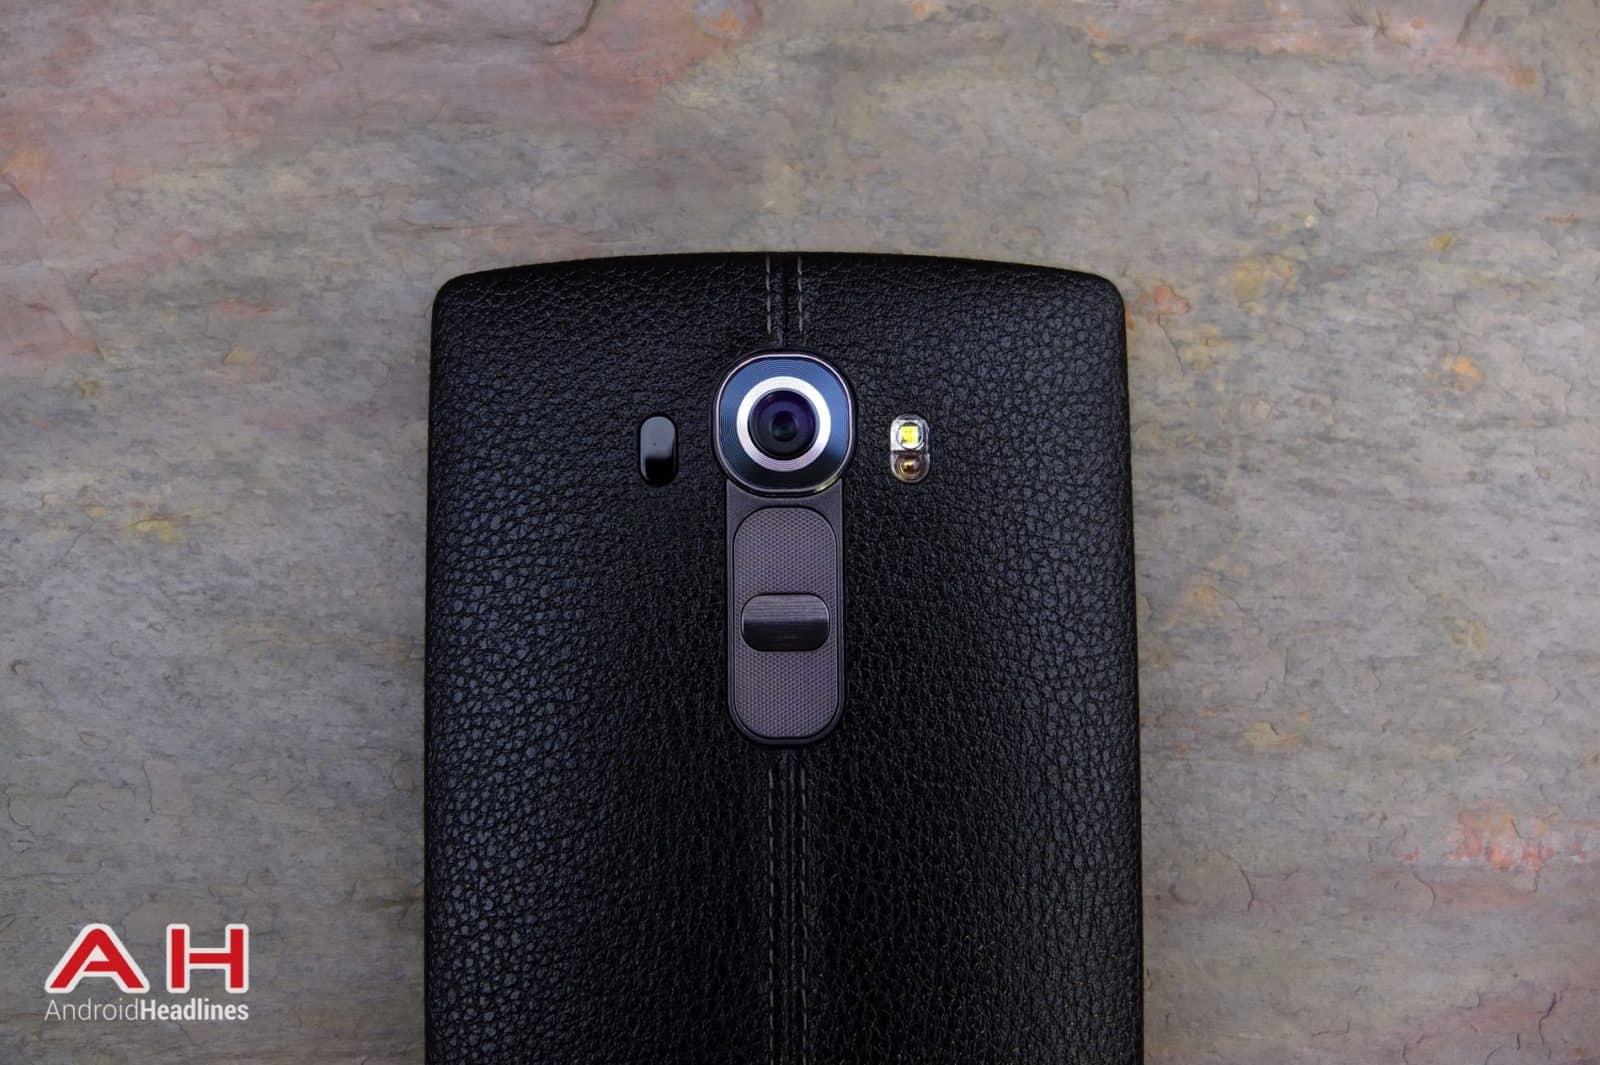 LG G4 BlackLeather TD AH 13